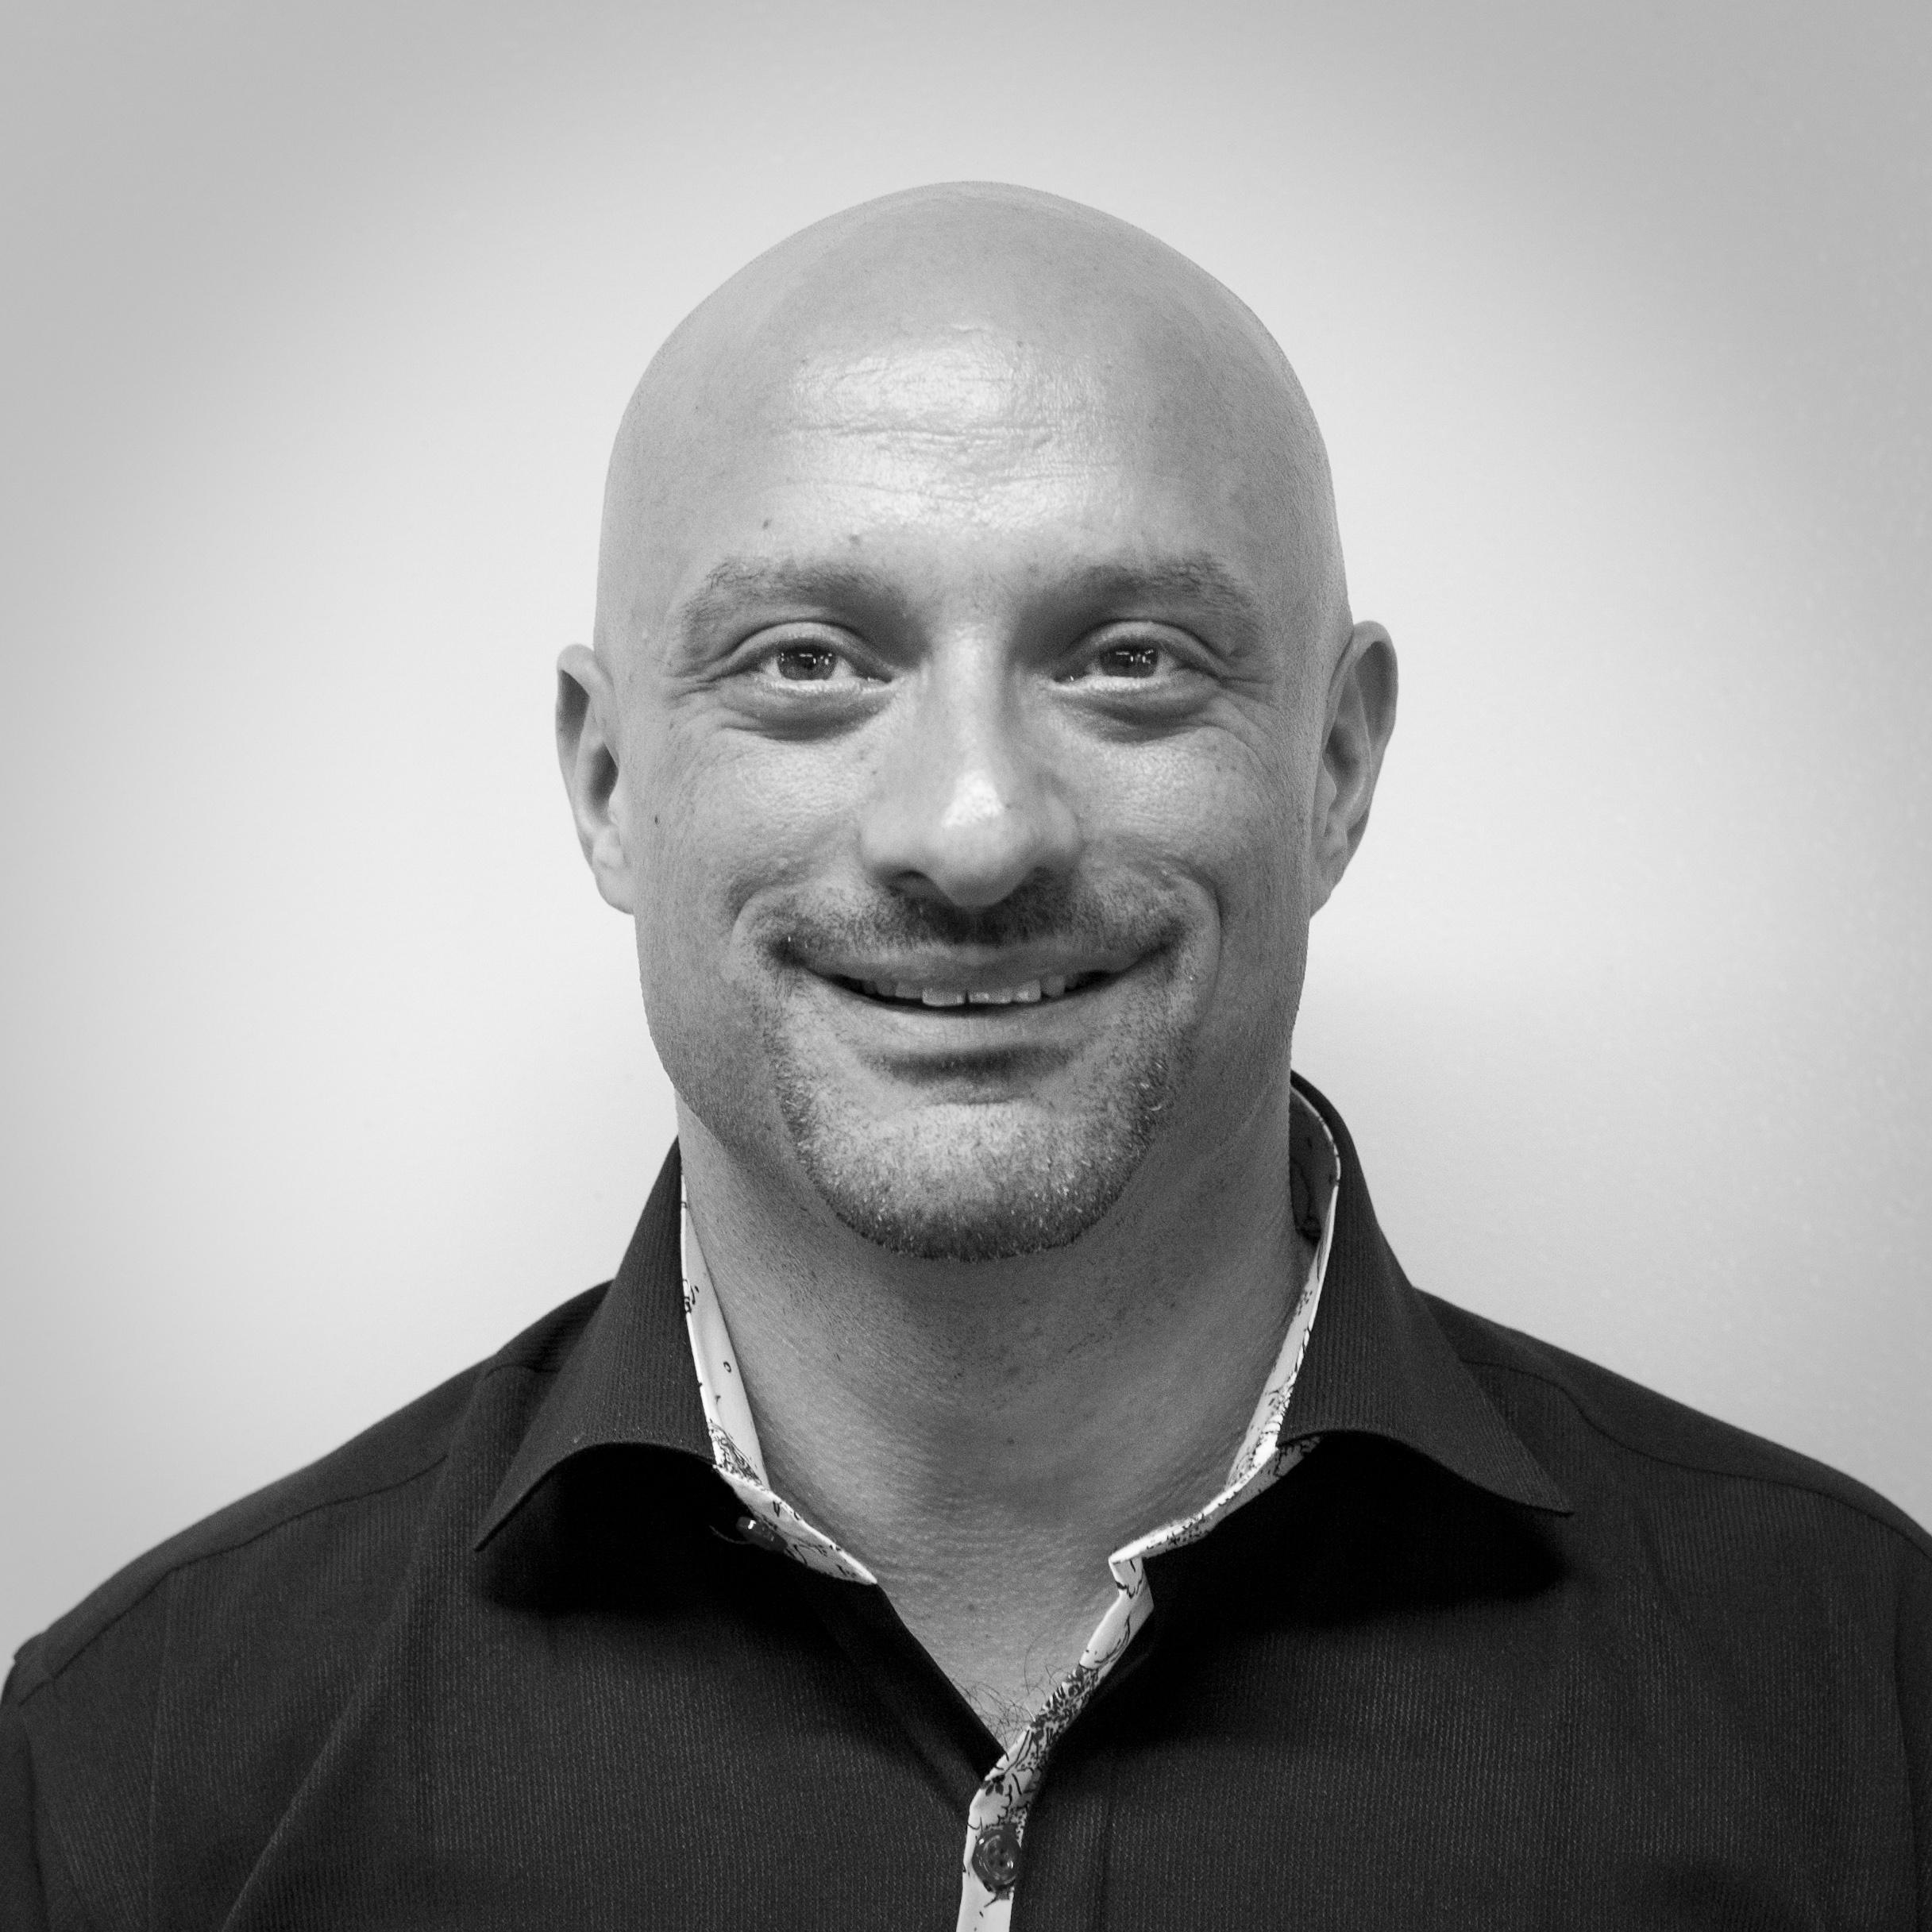 Jay Wampold, vice president of marketing at Chef.